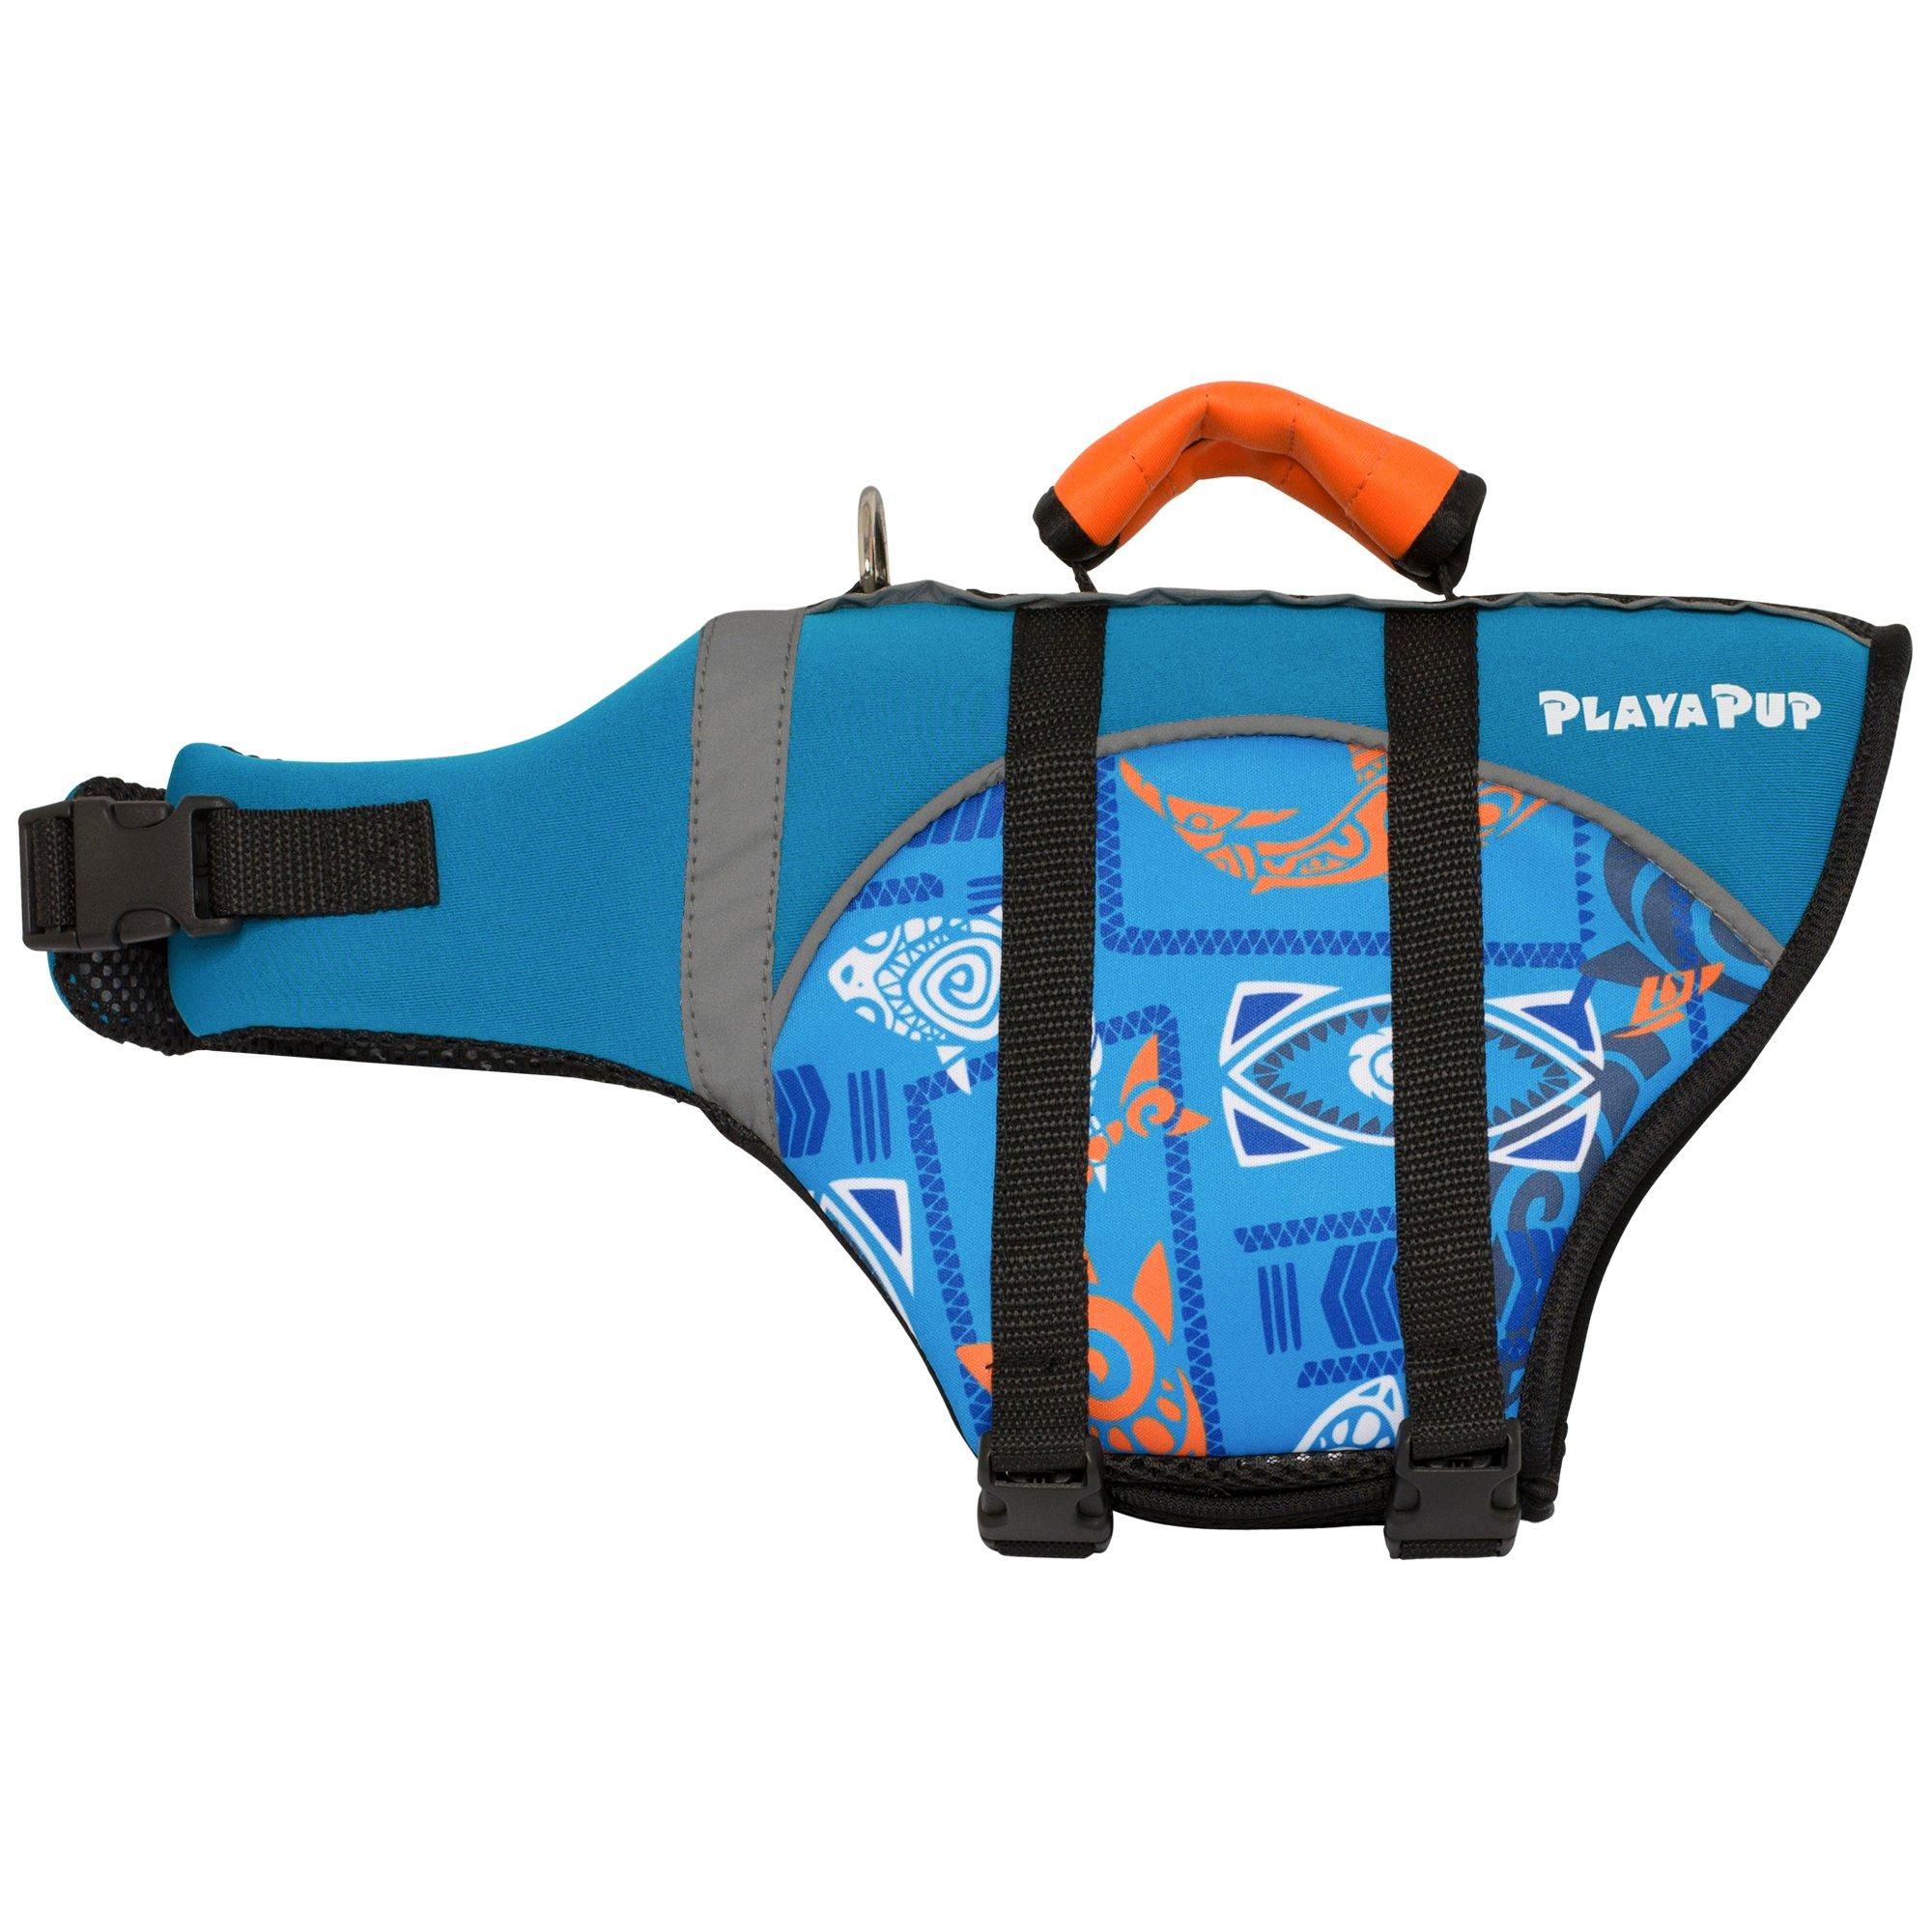 Image of Playa Pup Pet Flotation Vest Blue Shark, Small, Blue / Orange